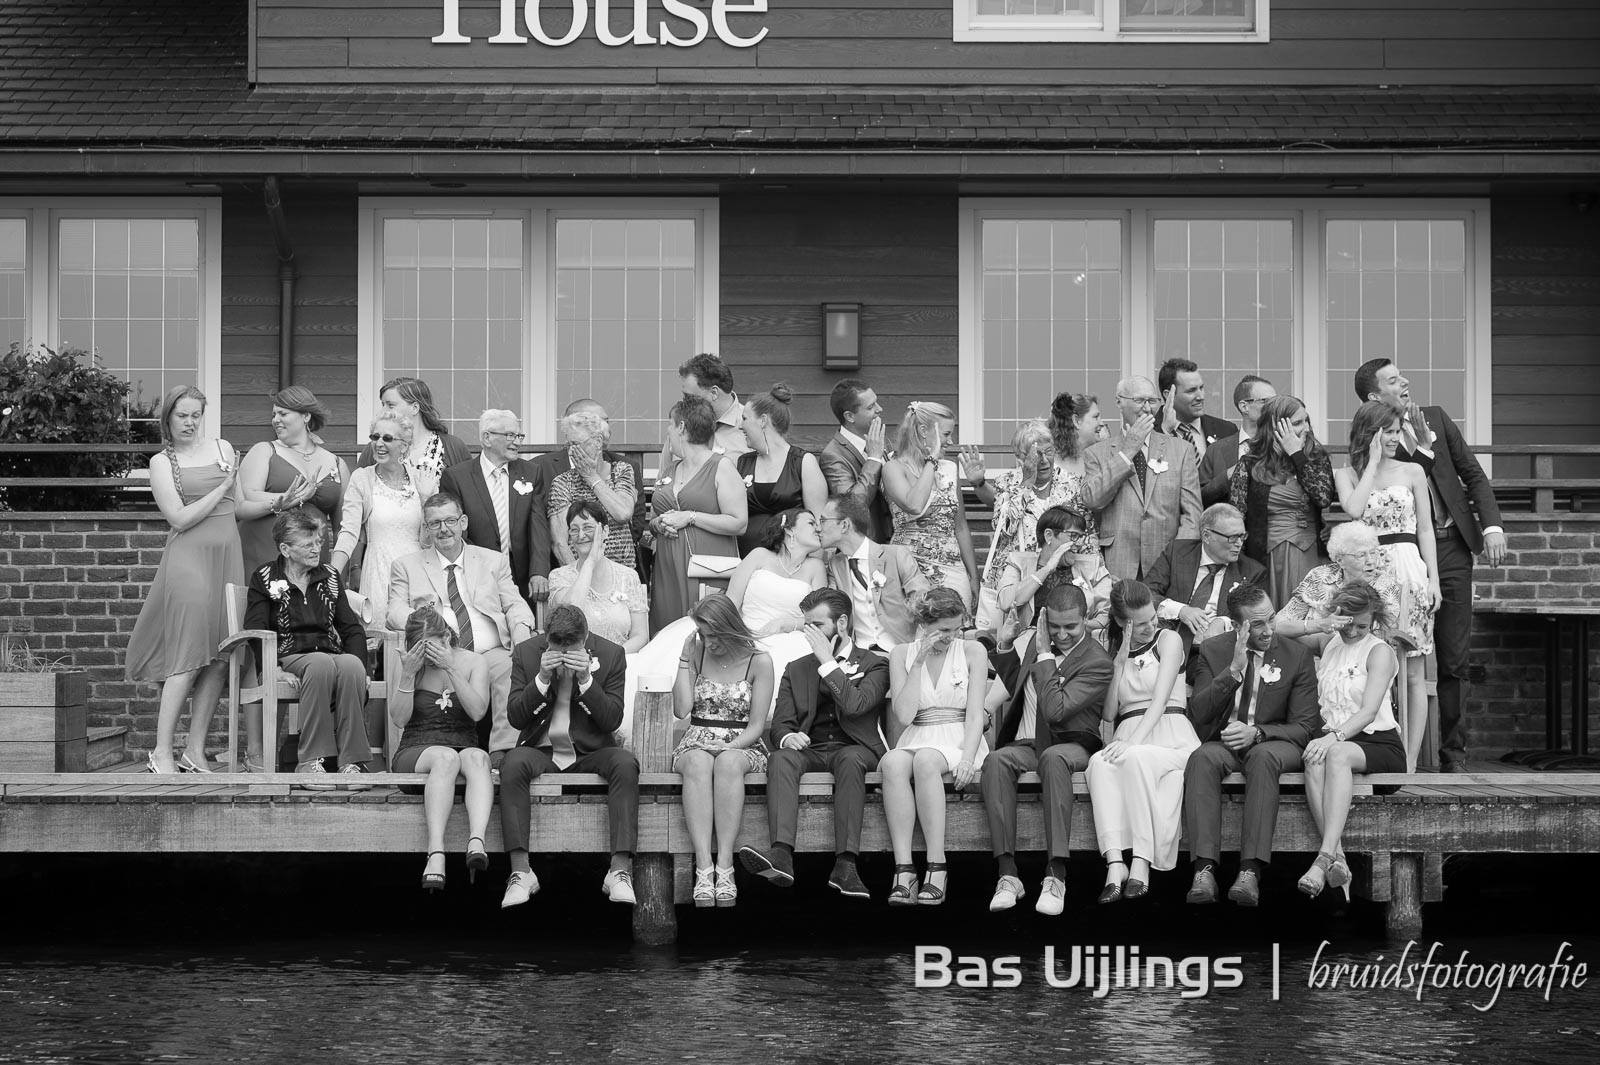 Bruidsfotografie Almere bij The BoatHouse